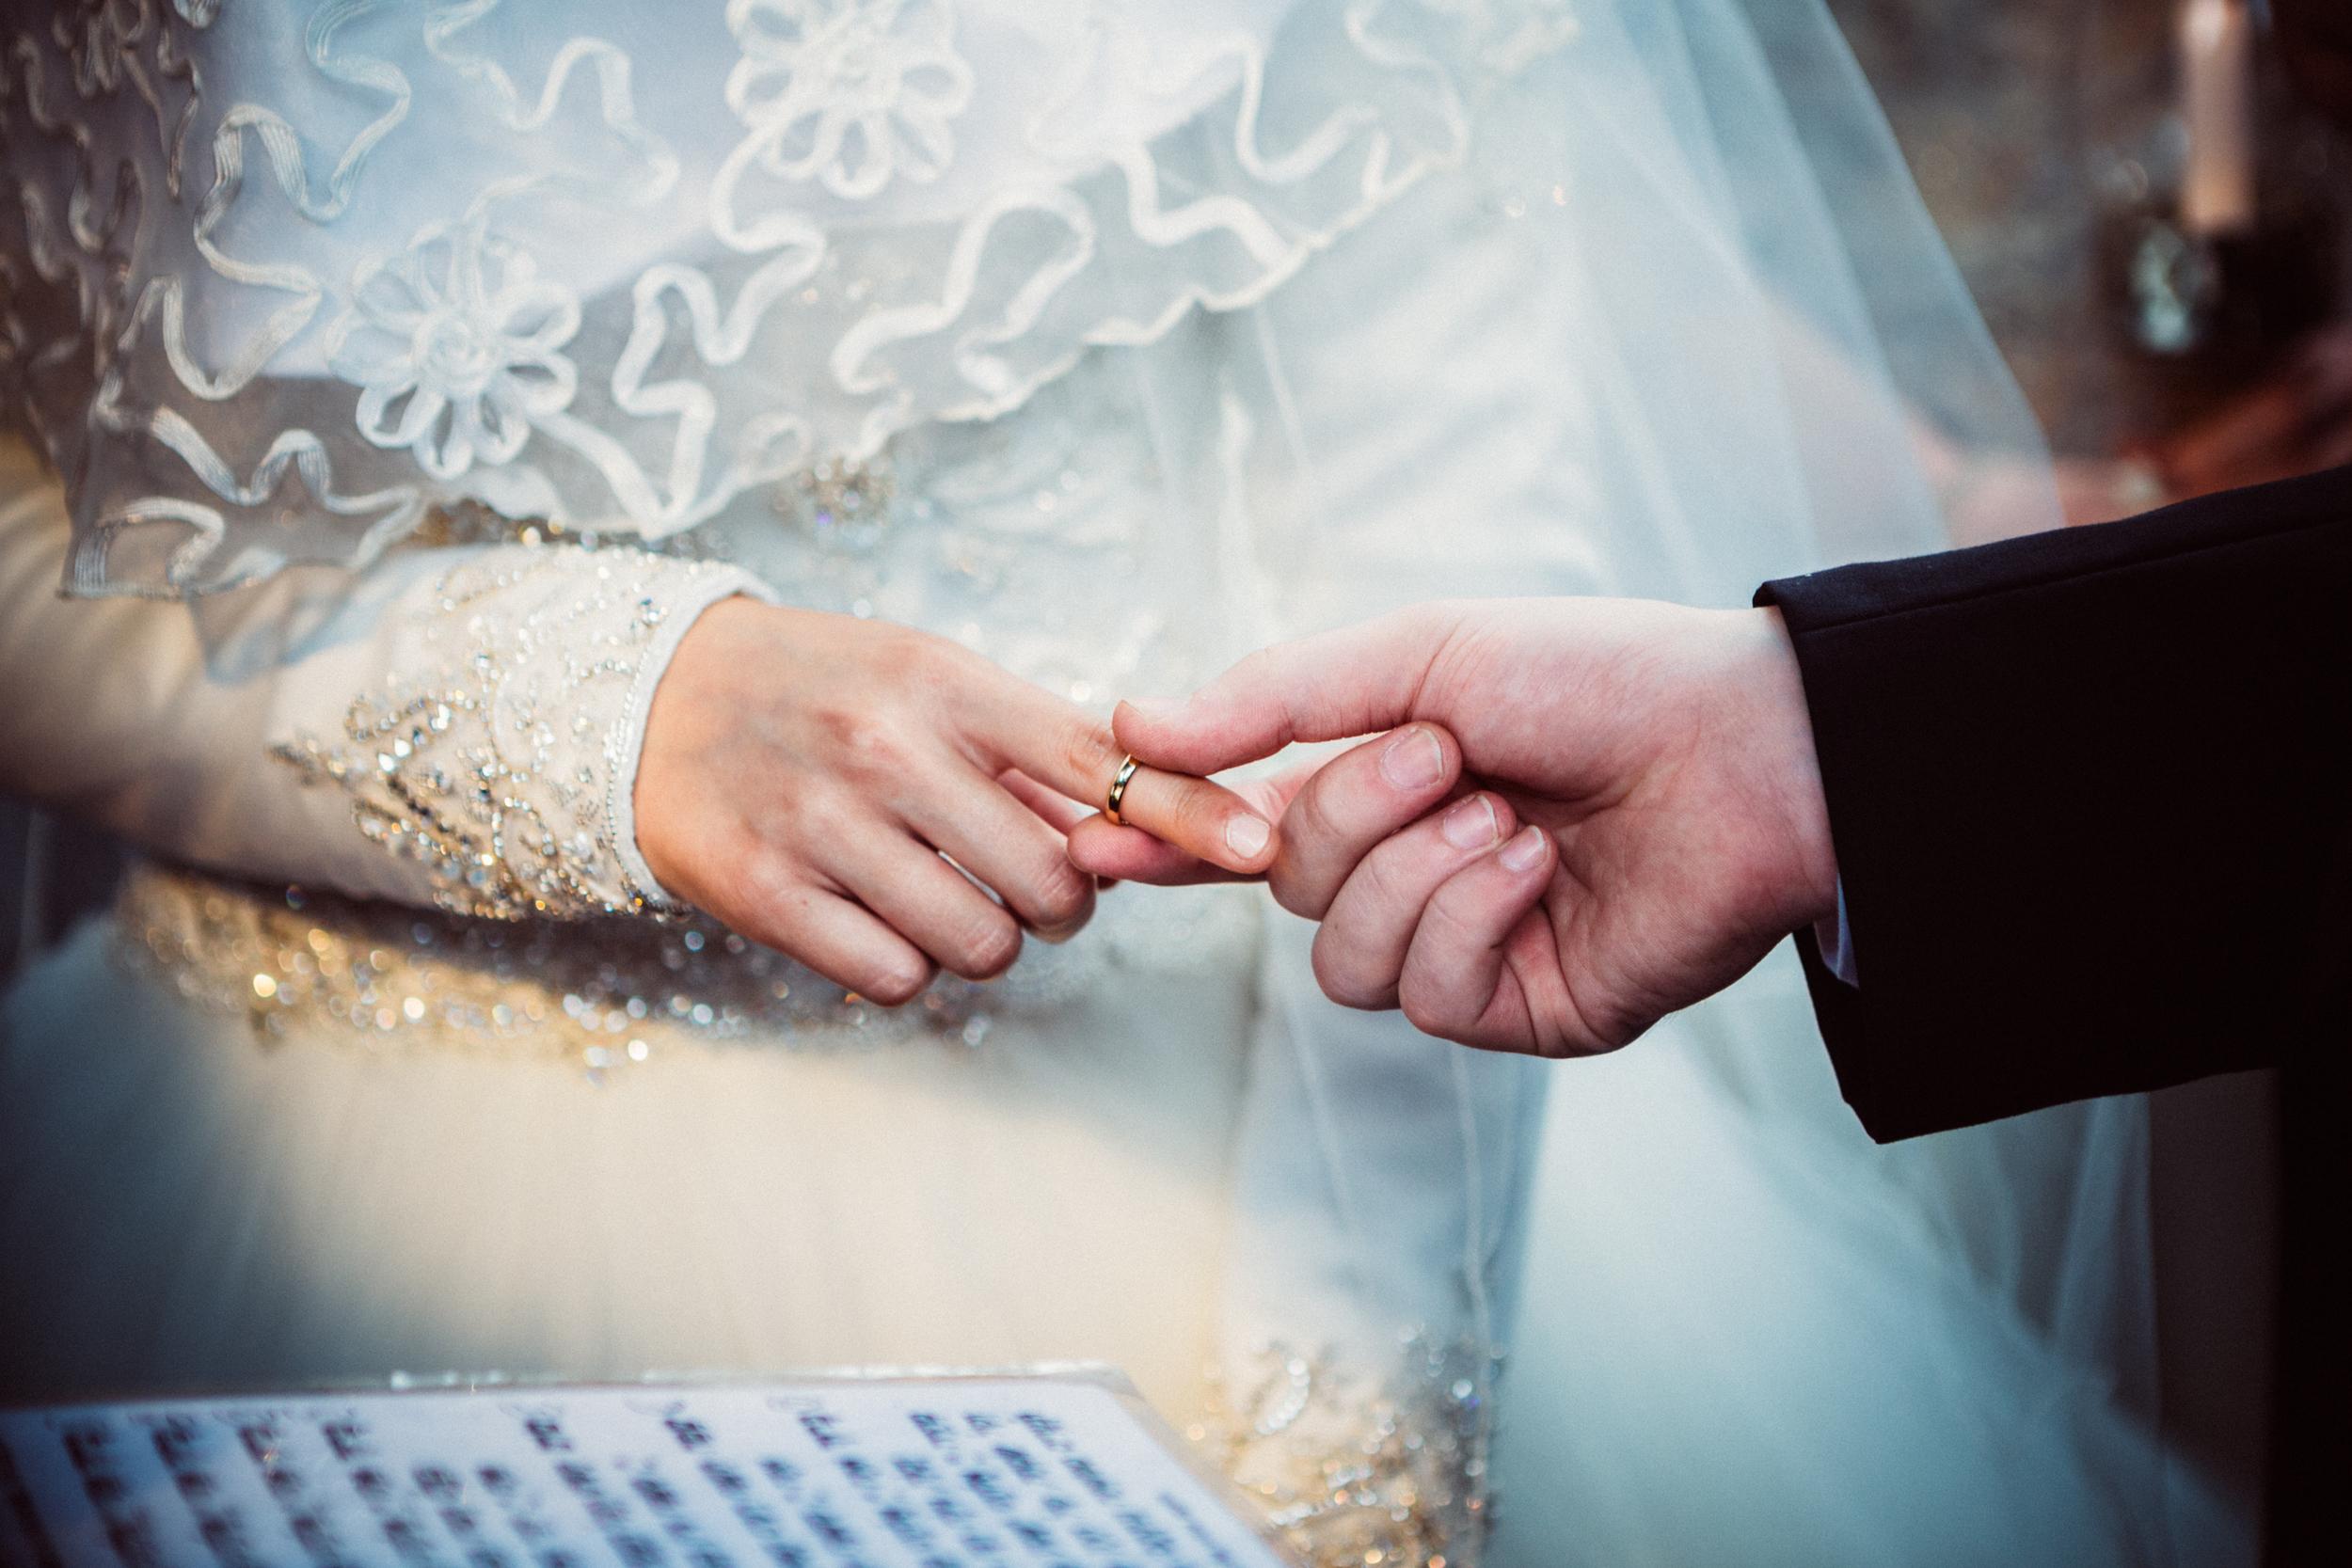 Wedding Iossi and Gitty Khafif  - Eliau Piha studio photography, new york, events, people 770 brooklyn -0464.jpg